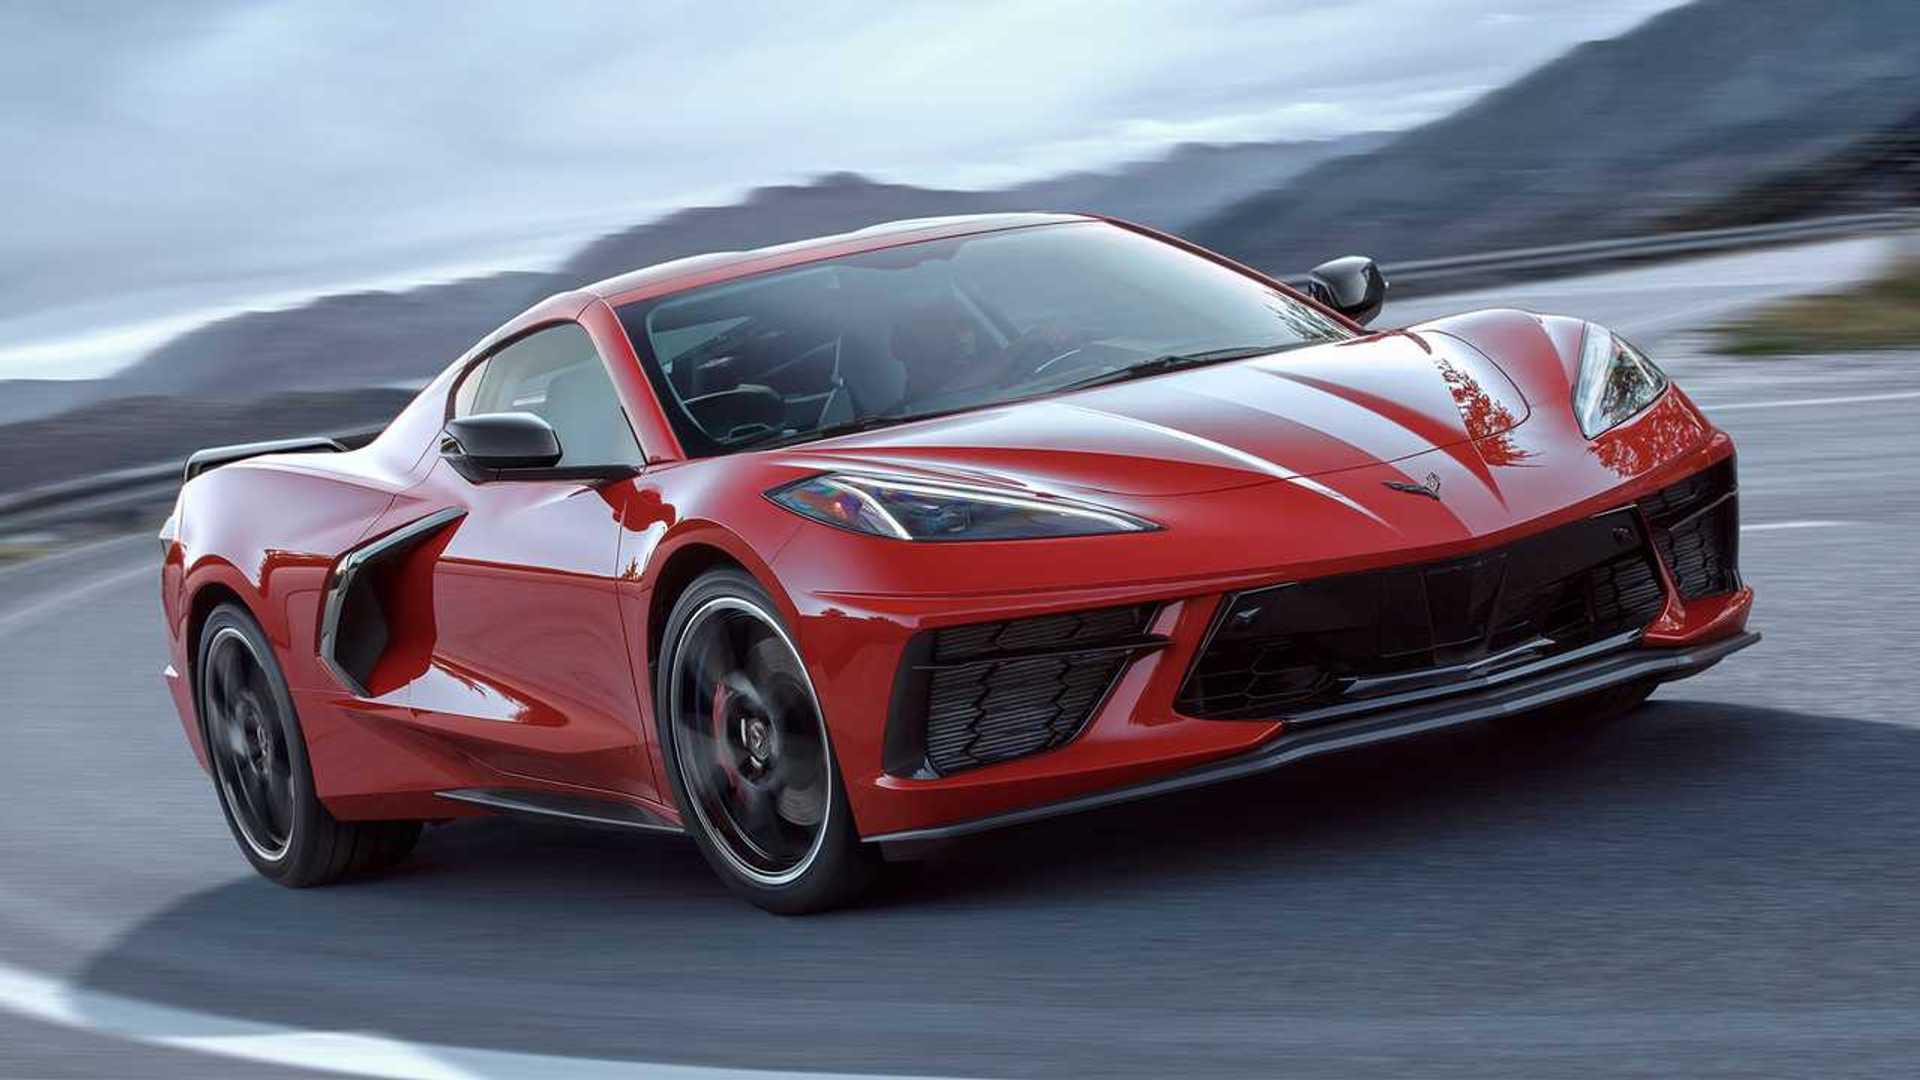 Kelebihan Kekurangan Chevrolet Corvette Review